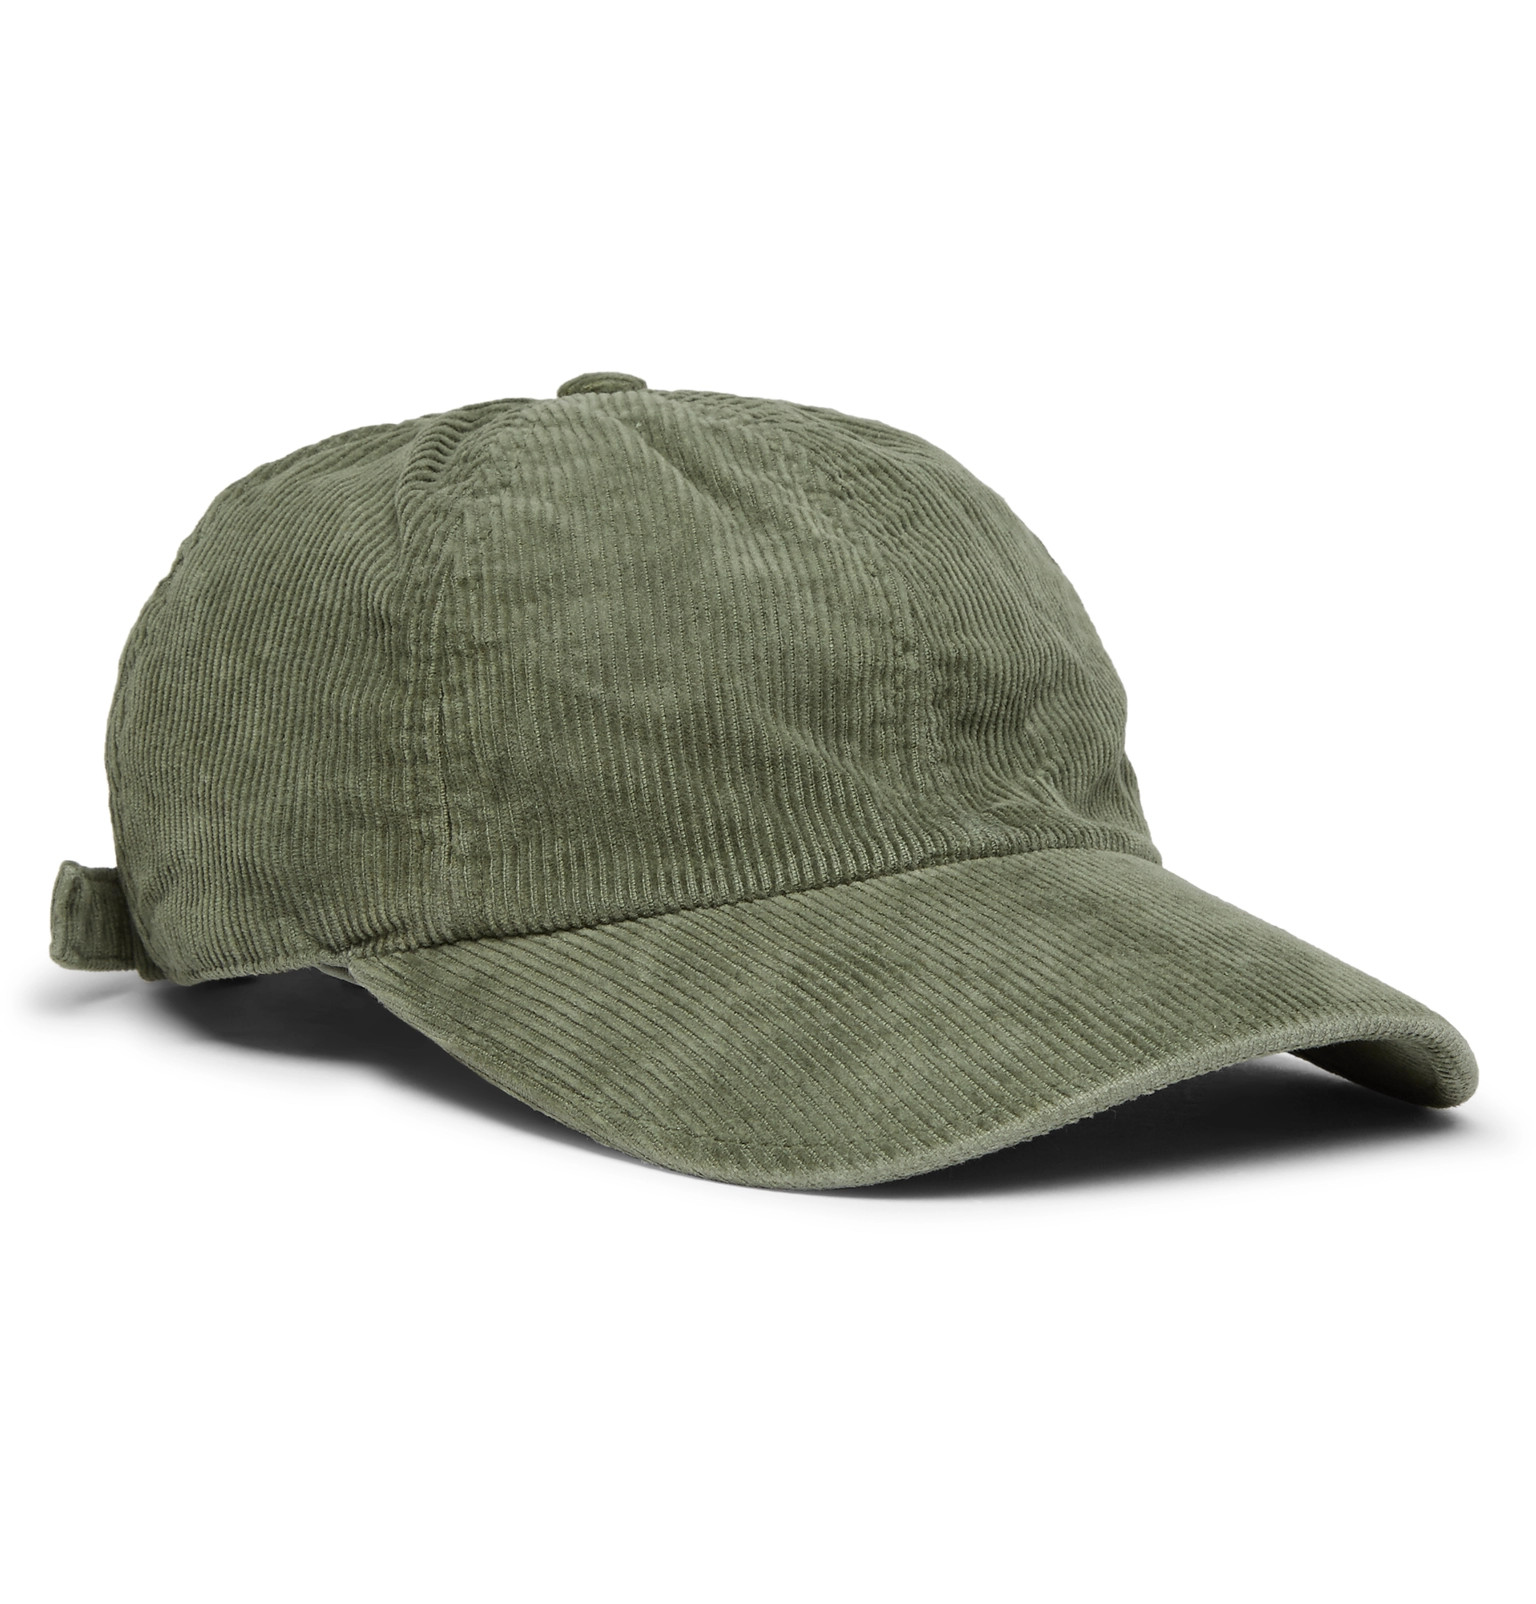 32abad08935 Officine Generale - Cotton-Corduroy Baseball Cap